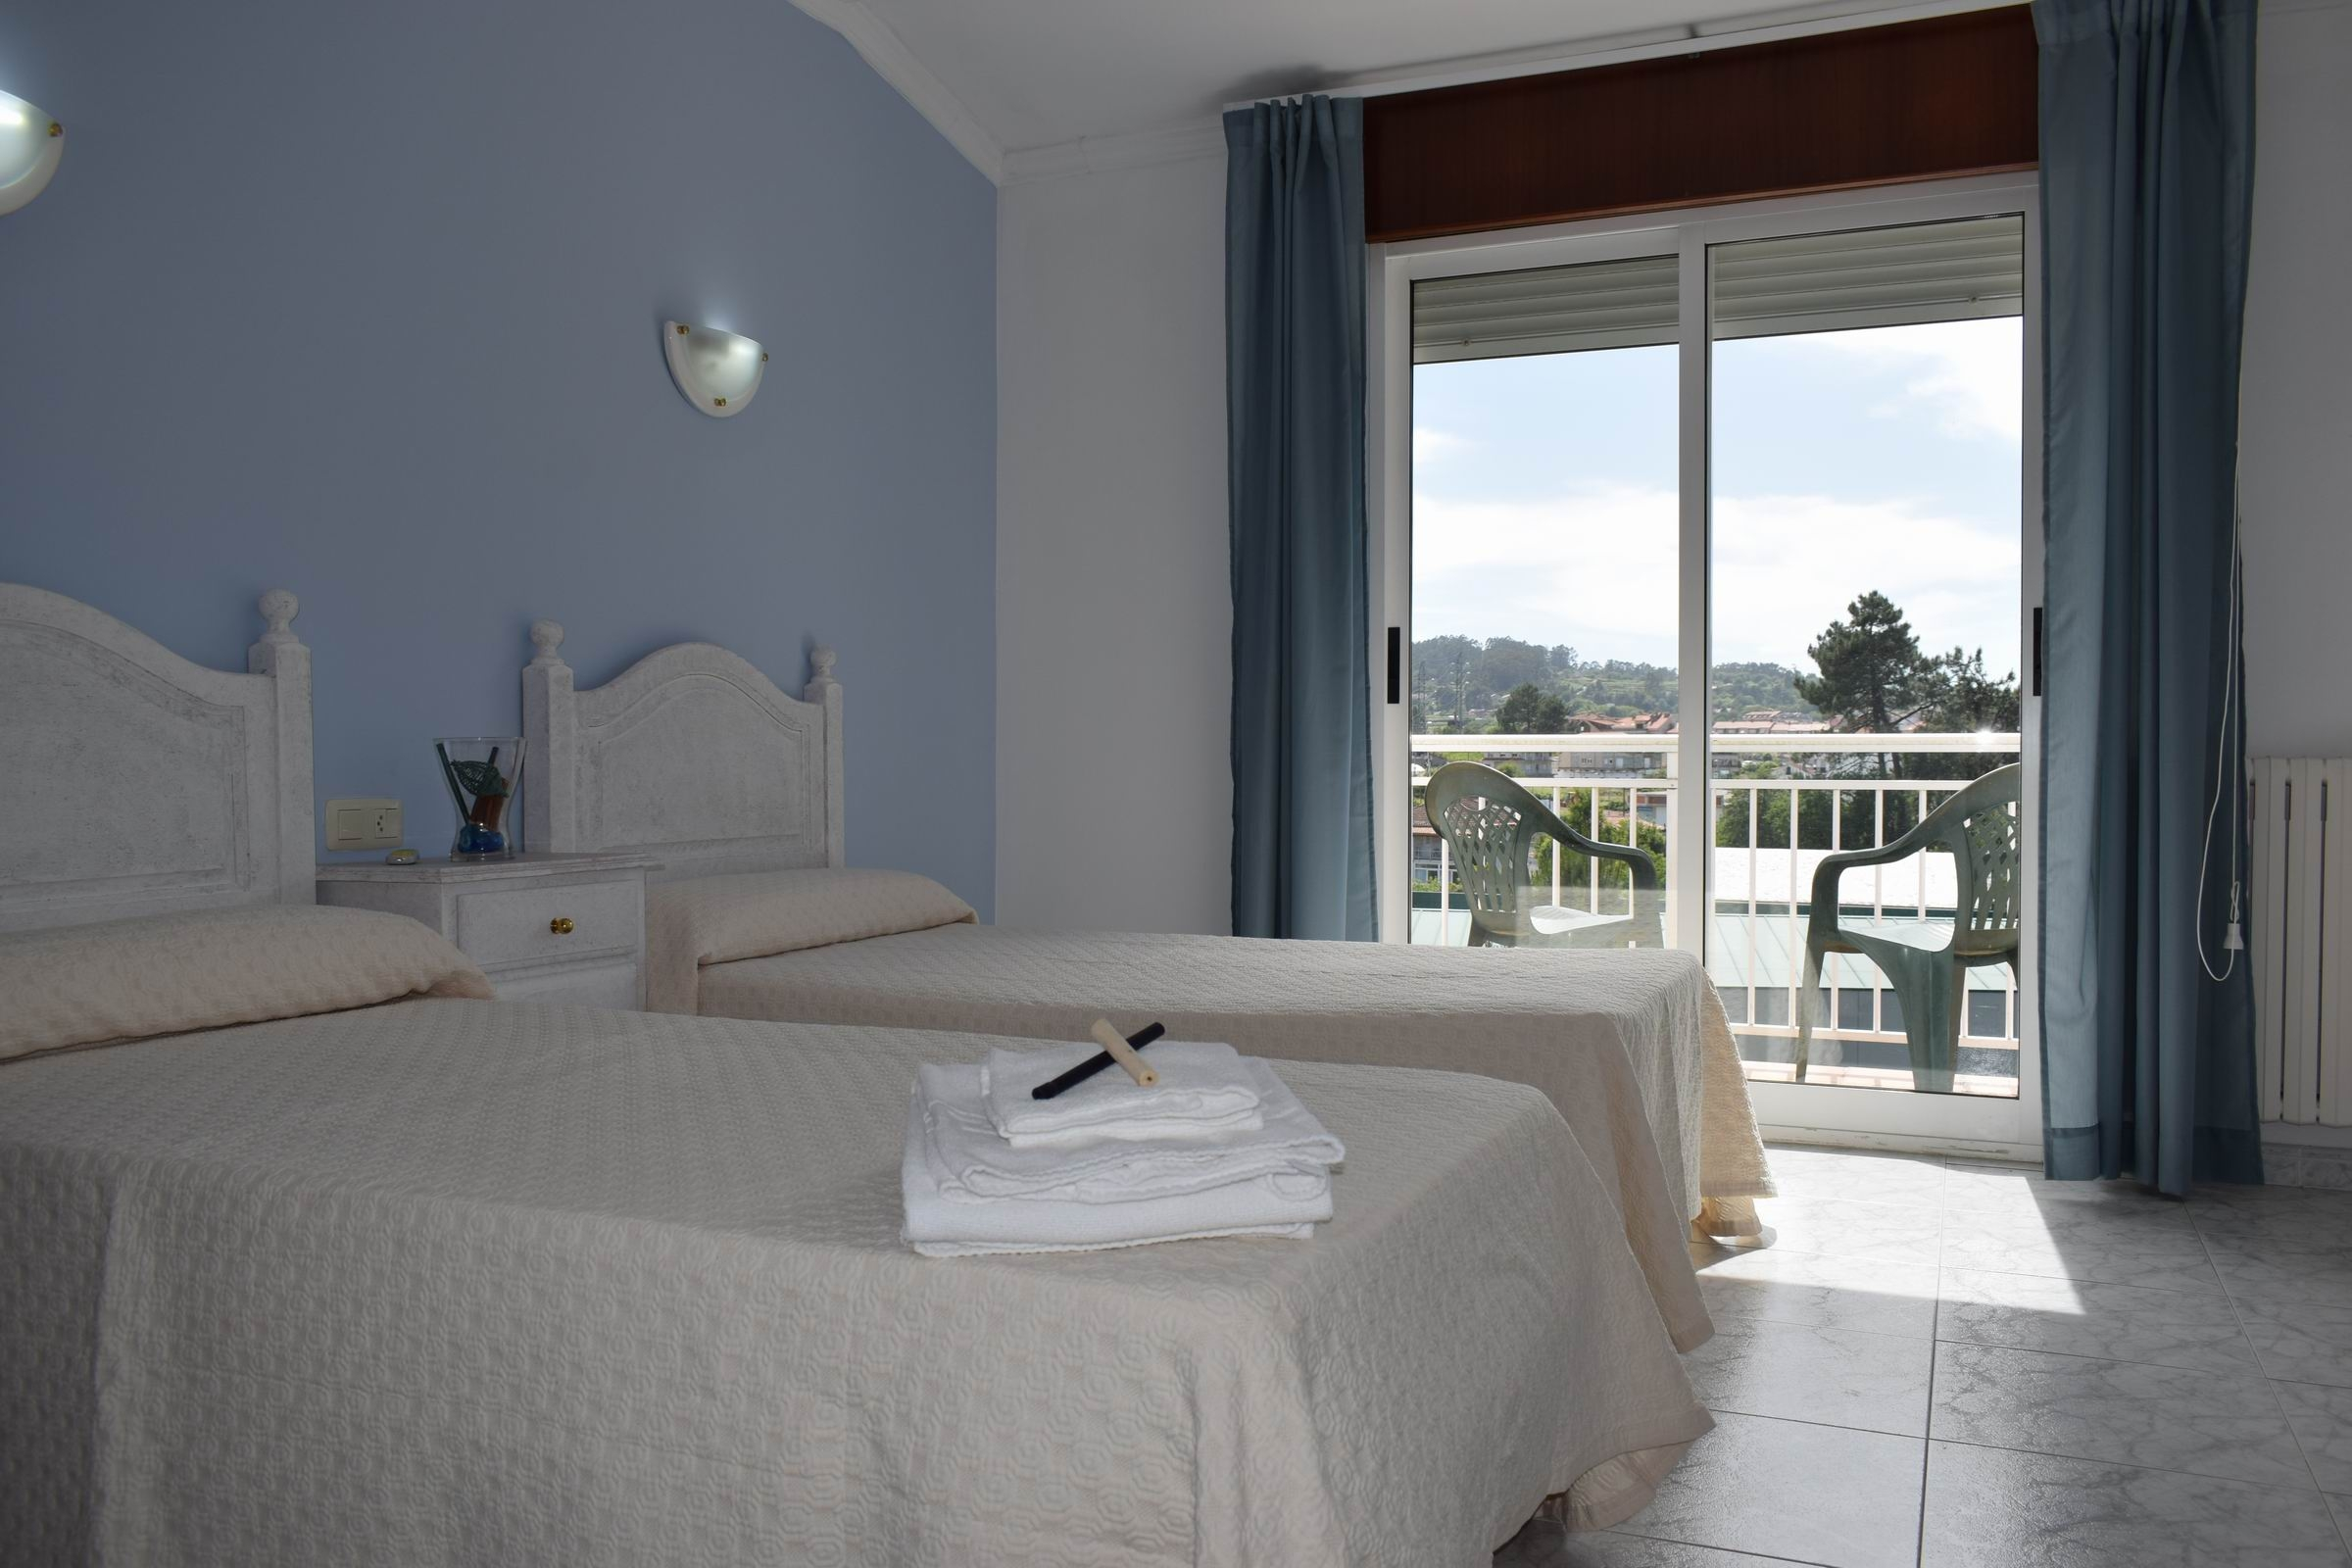 Hotel VIDA Xunca Blanca  -  15 Hab con Terraza 2